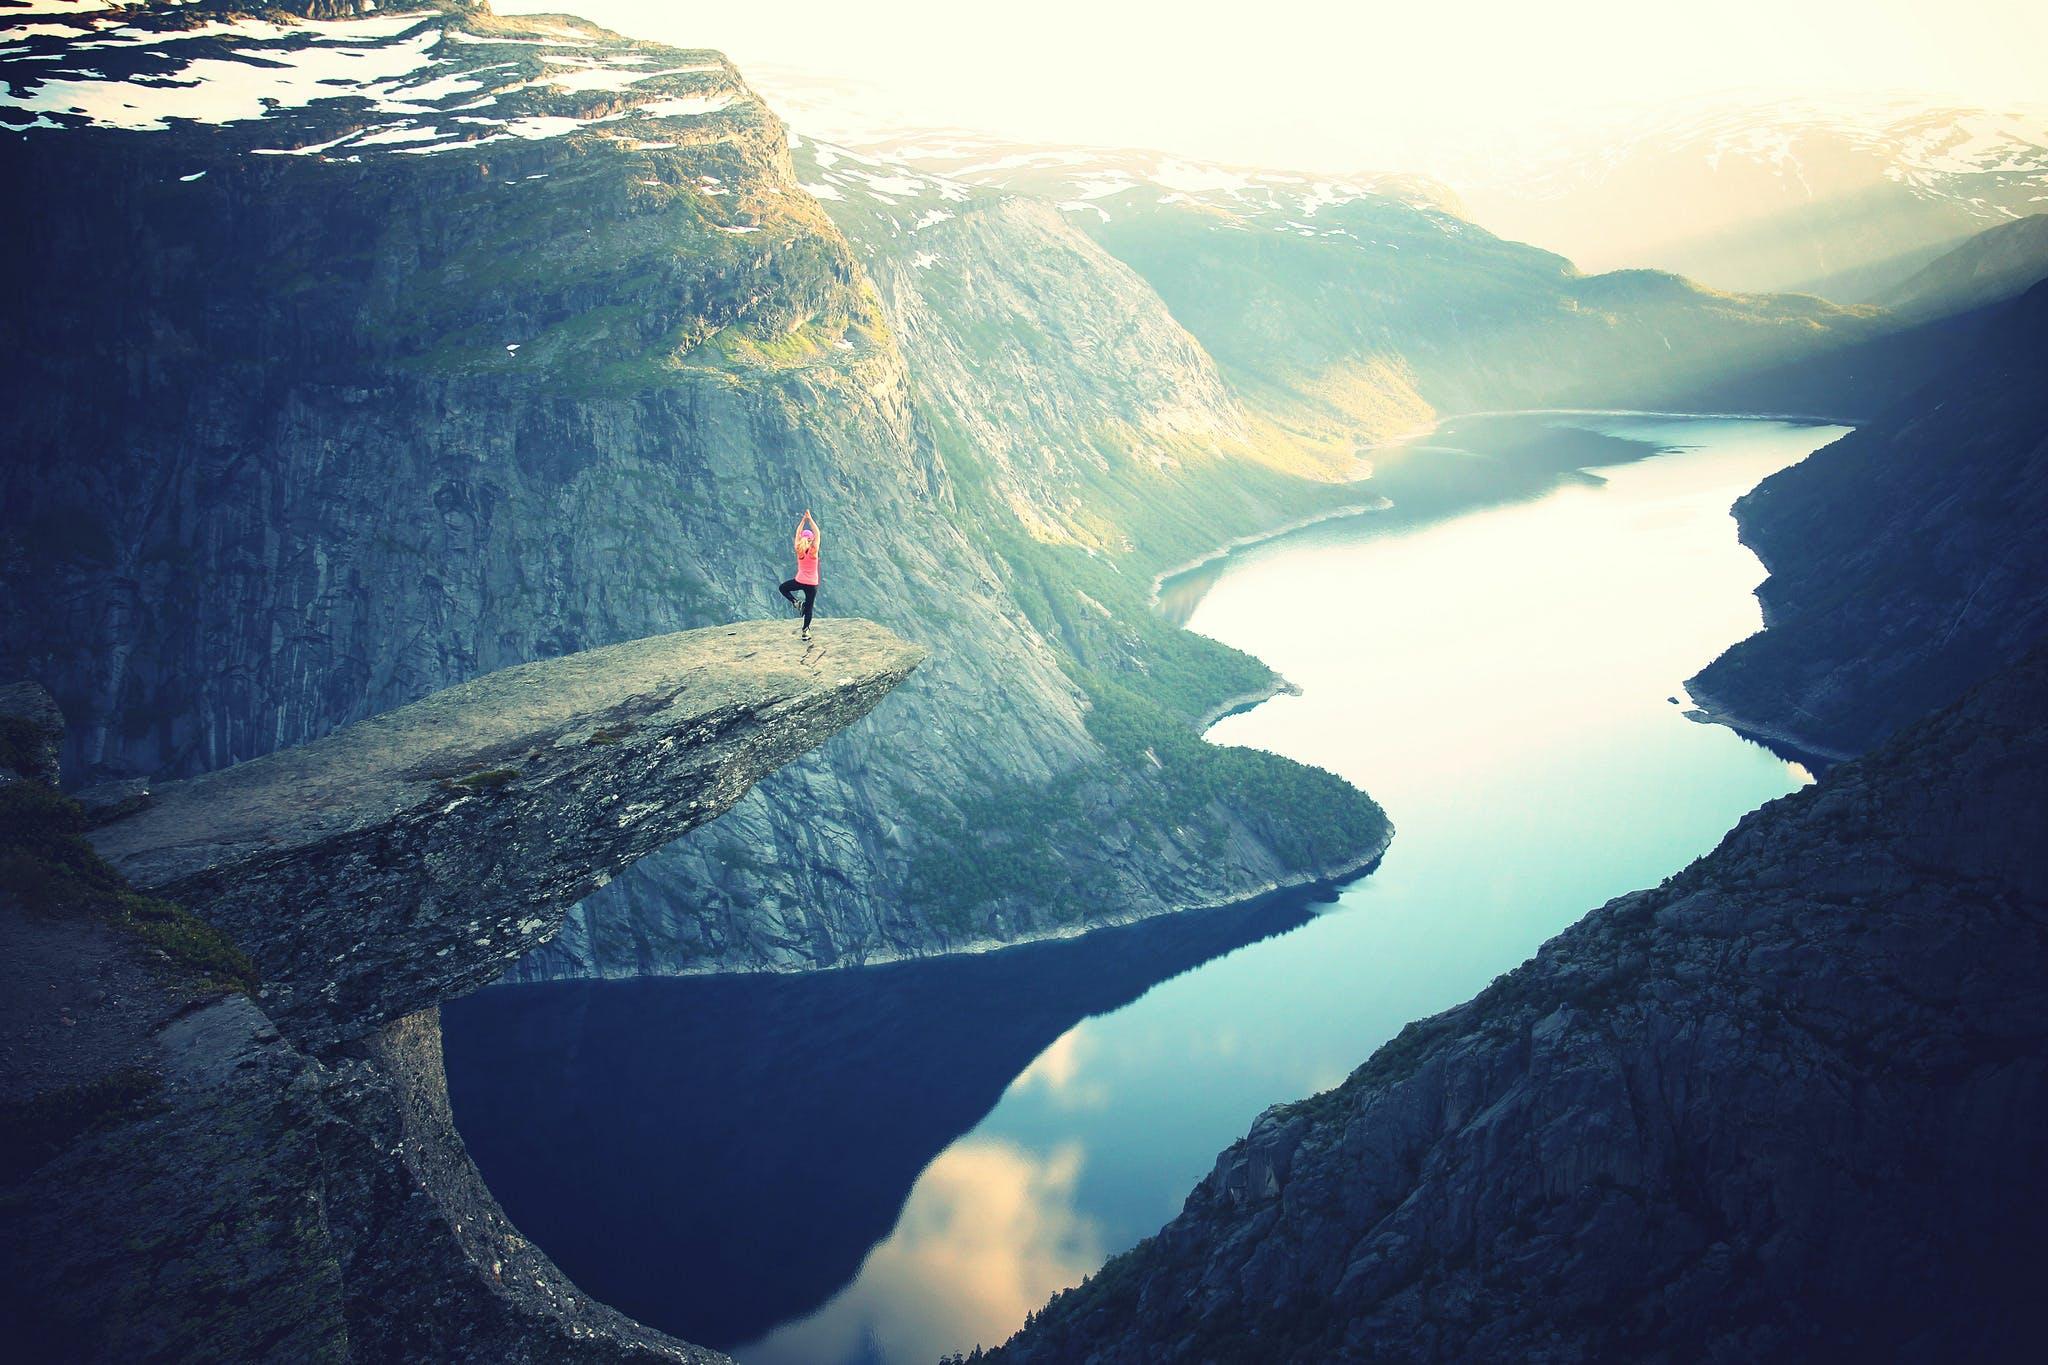 Fotos de stock gratuitas de acantilado, actitud, aventura, balance